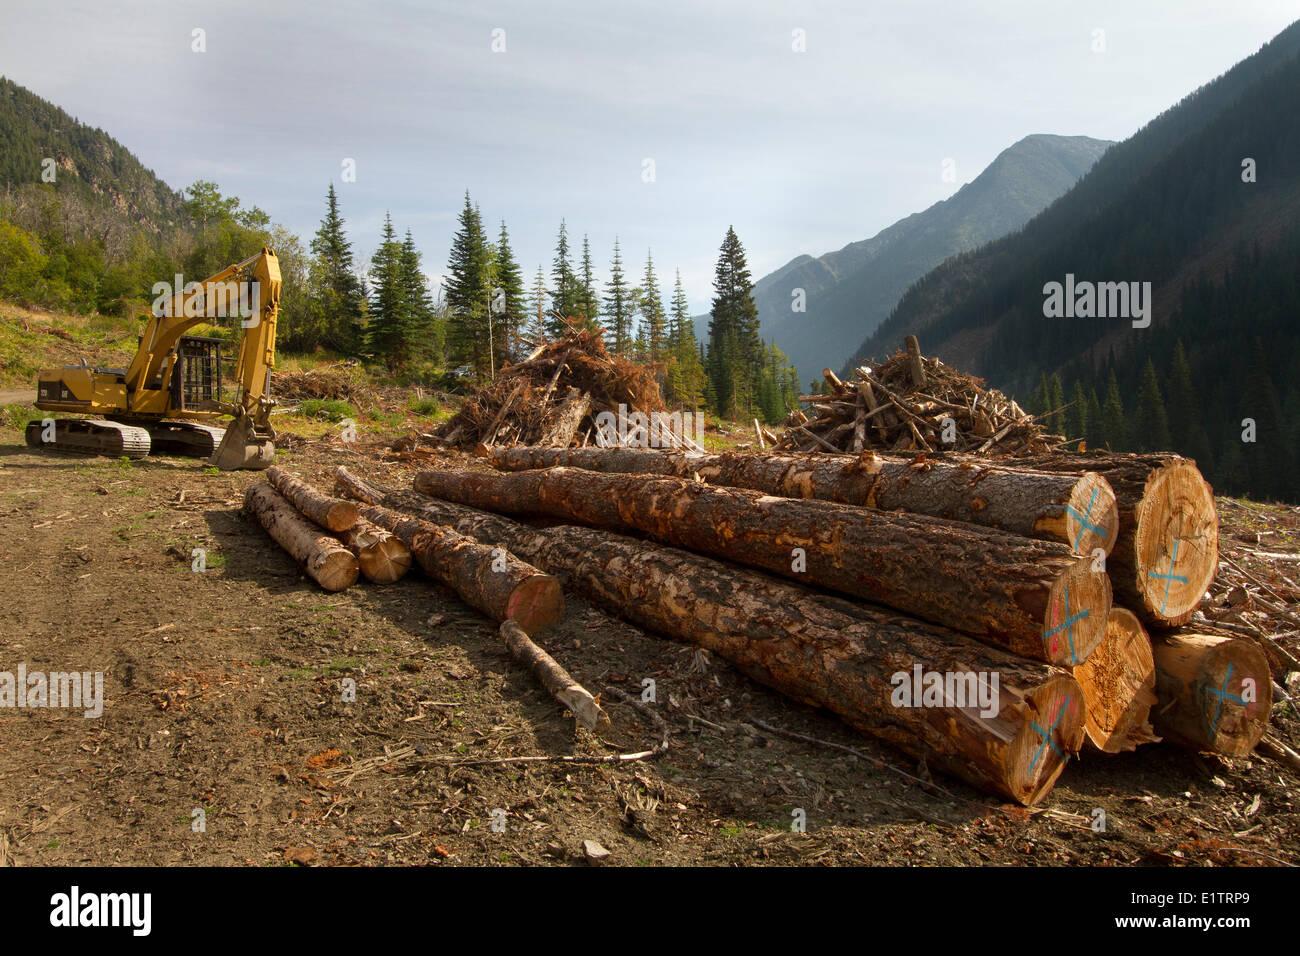 Clearcut Logging, spotted owl habitat destruction, fragmentation ...